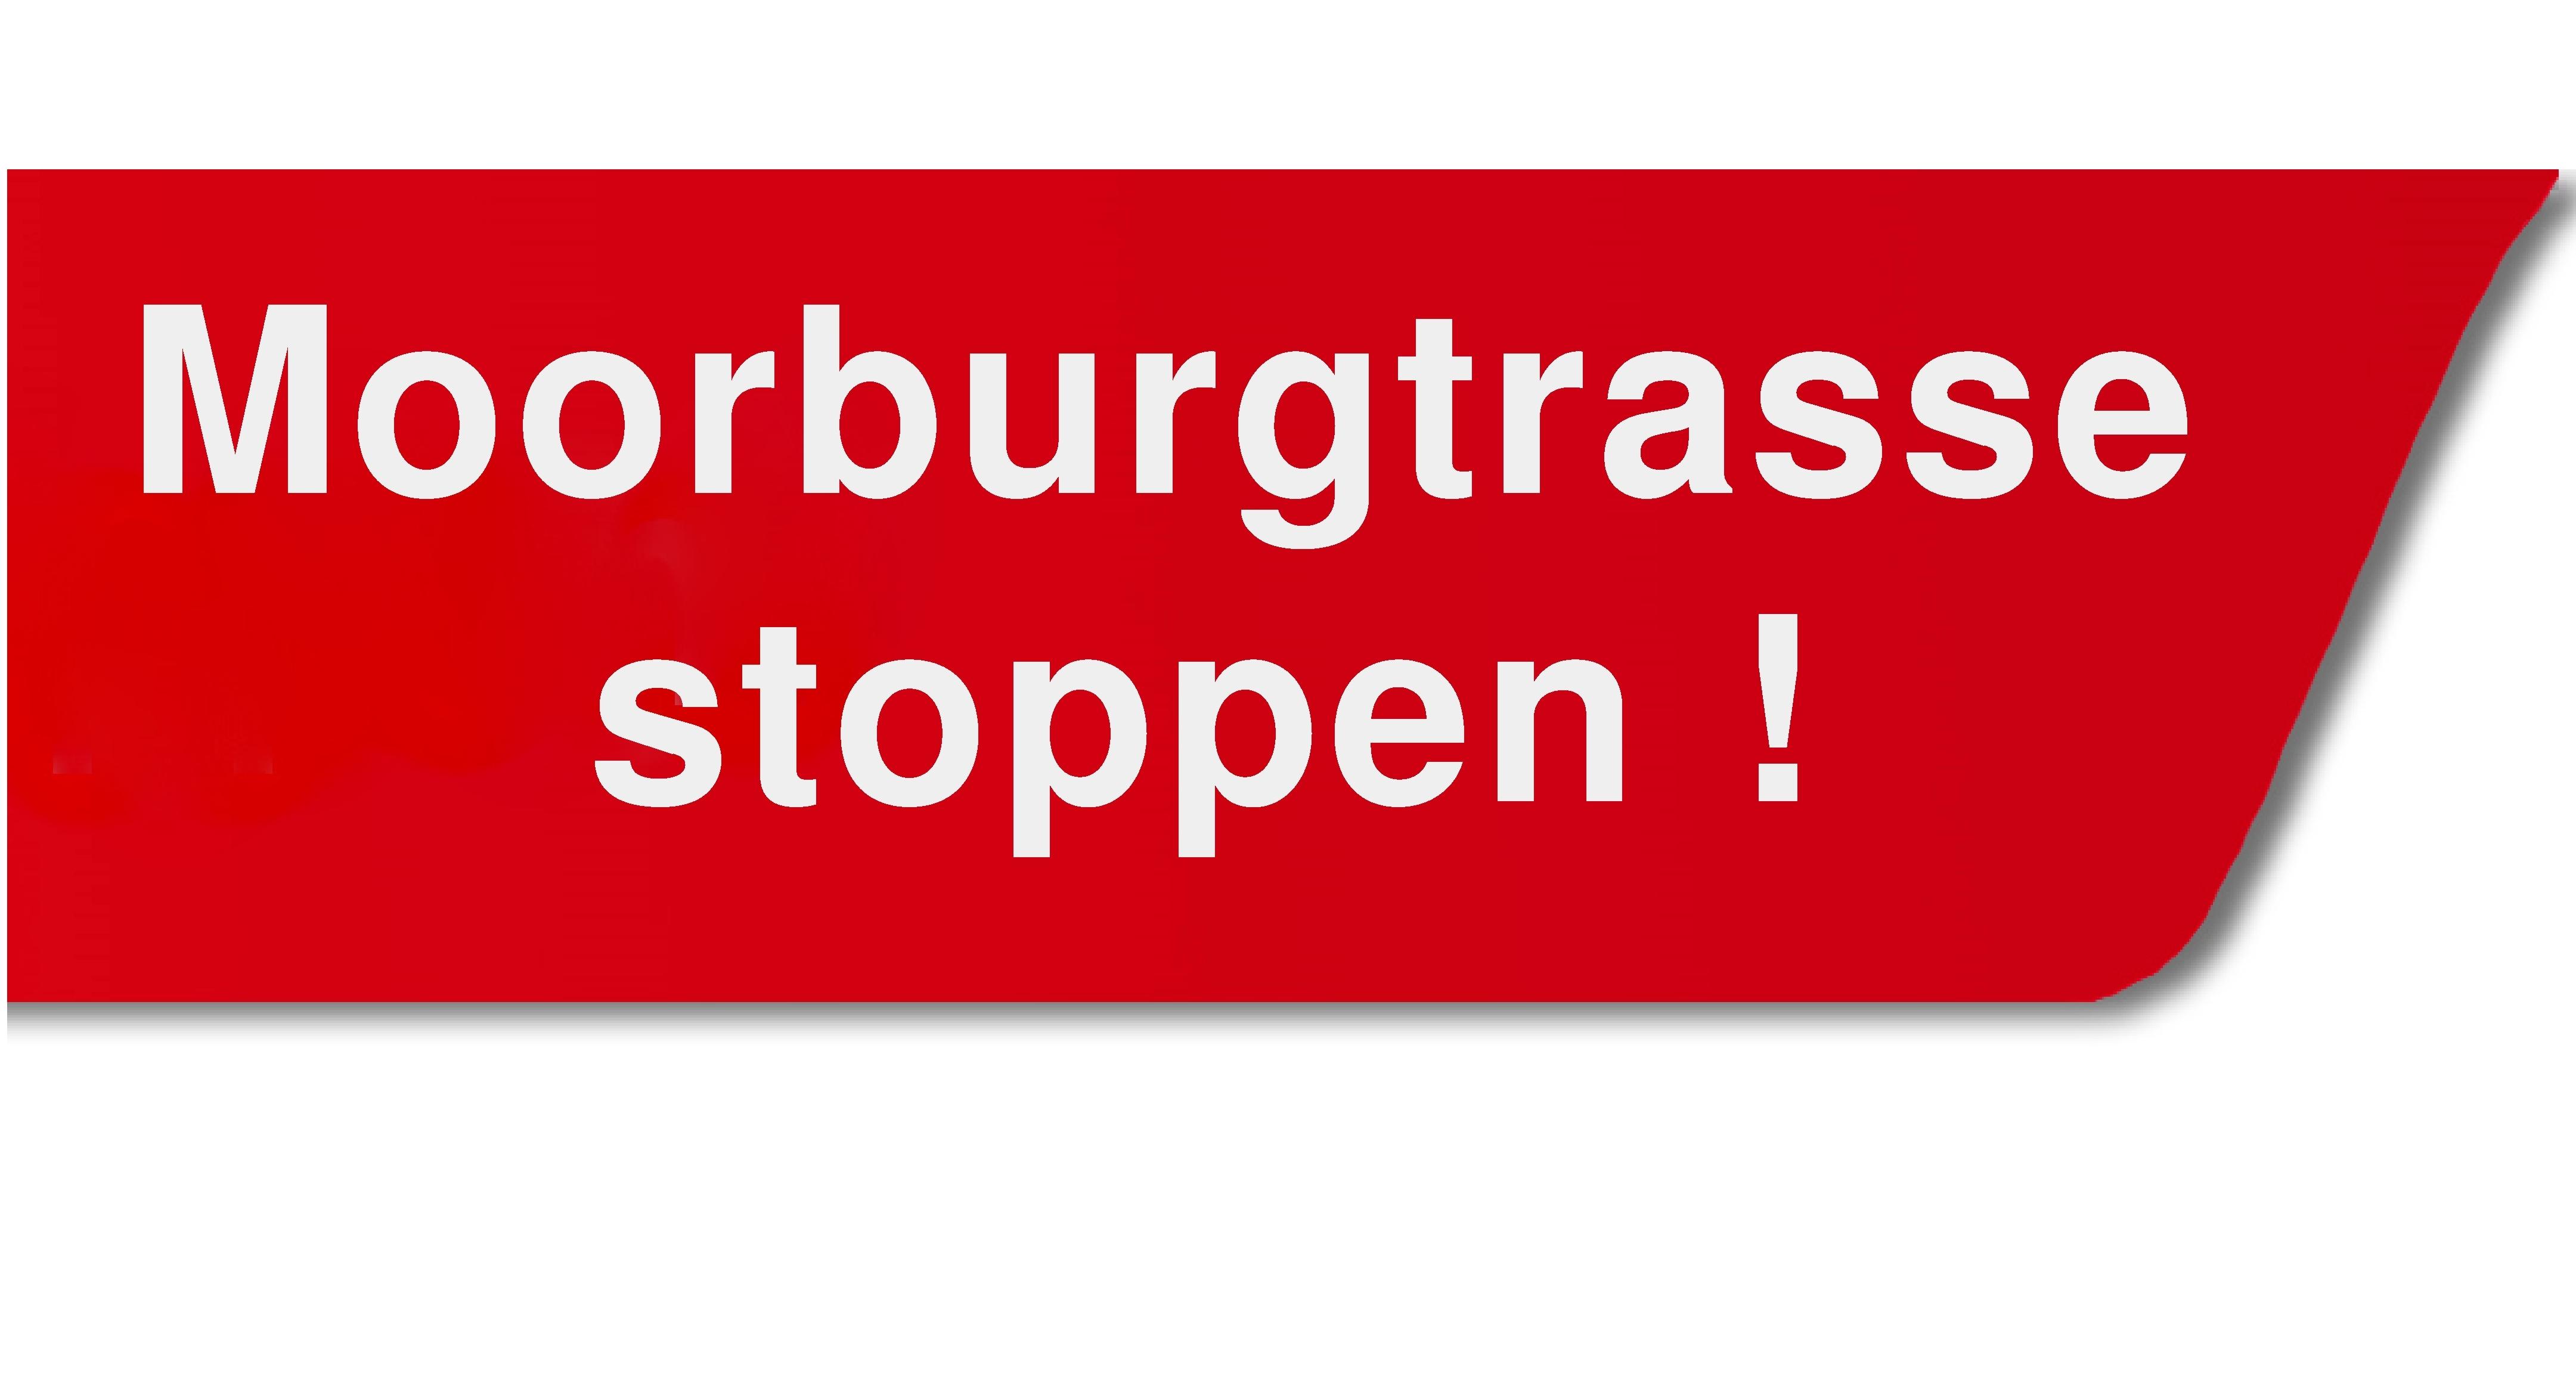 Moorburgtrasse-stoppen